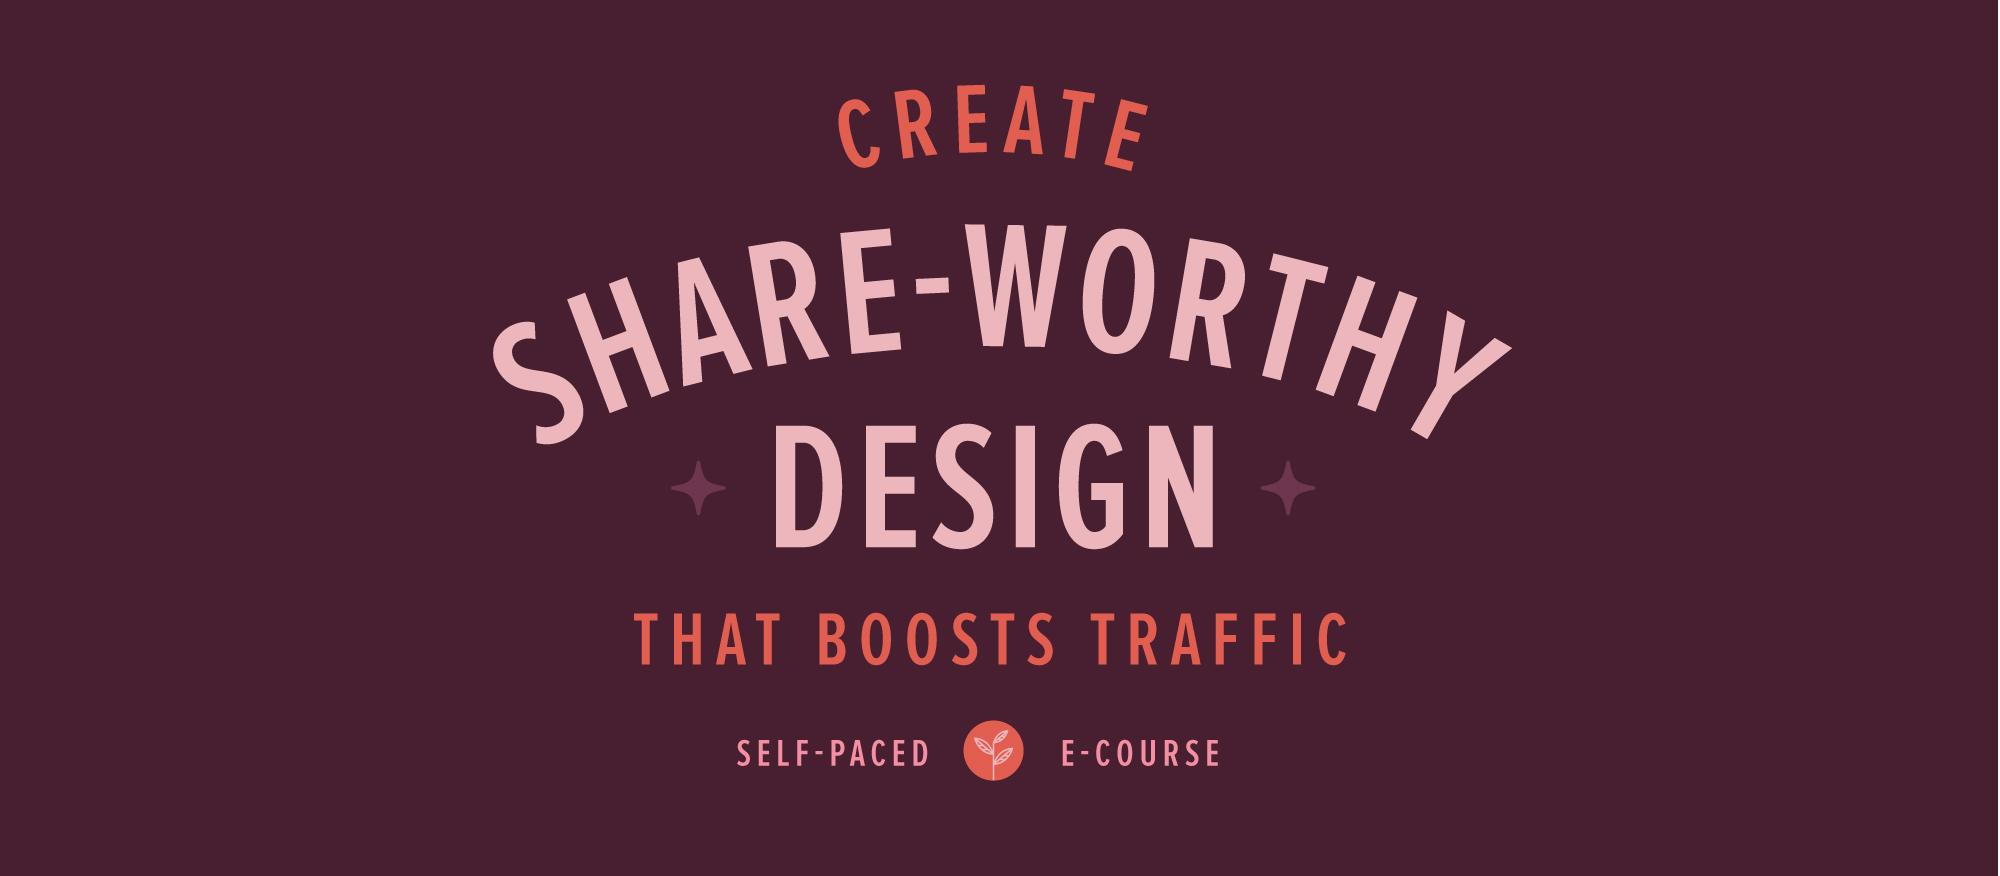 Share-worthy Design